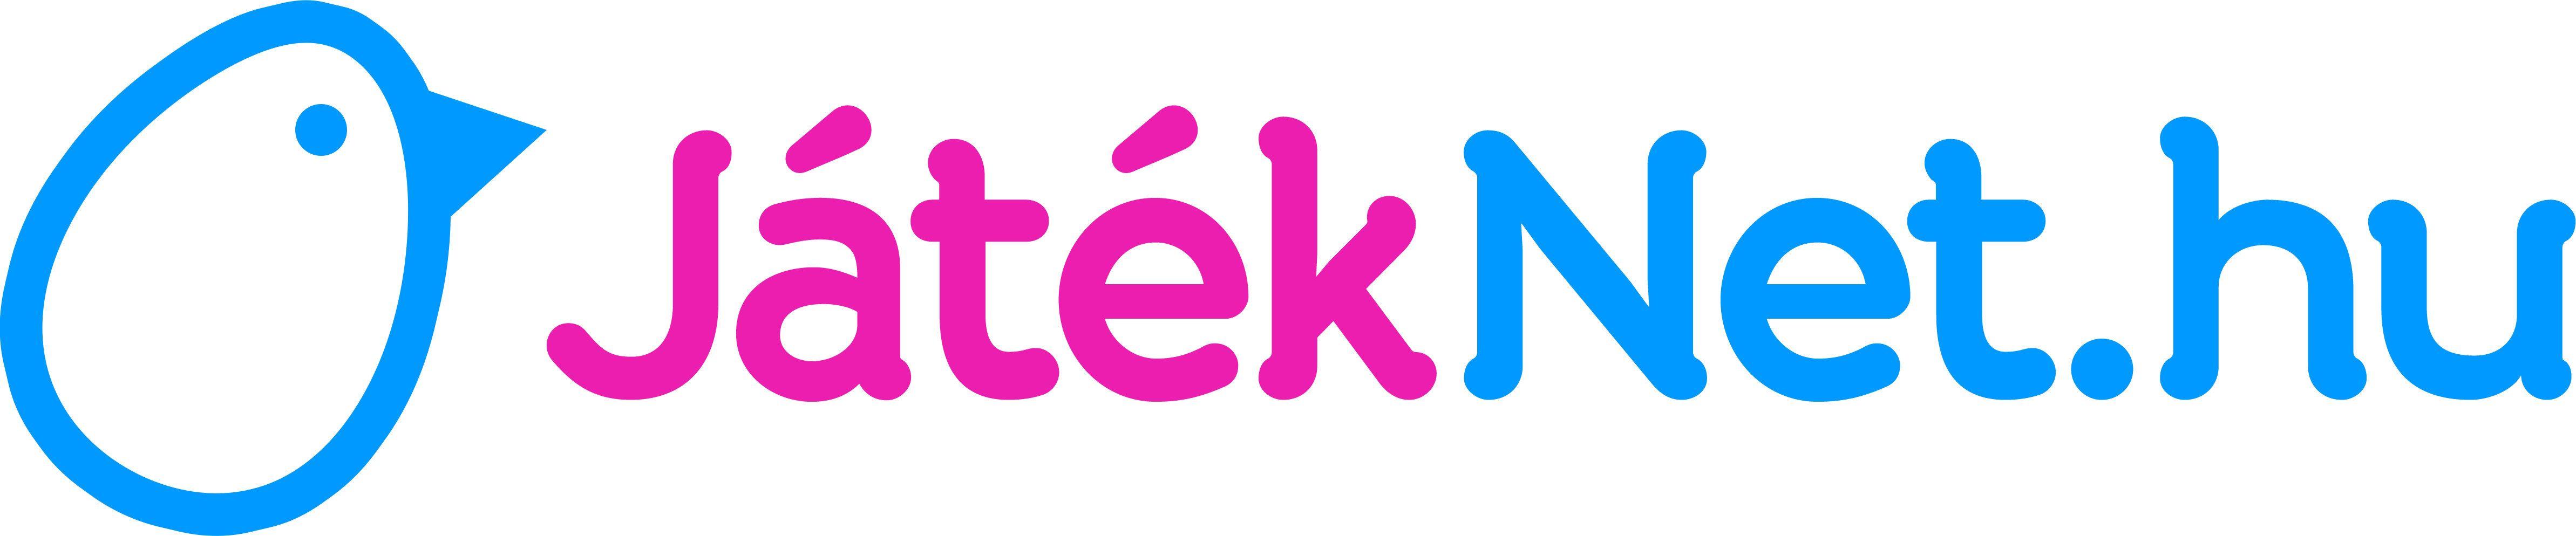 jateknet.hu-logo